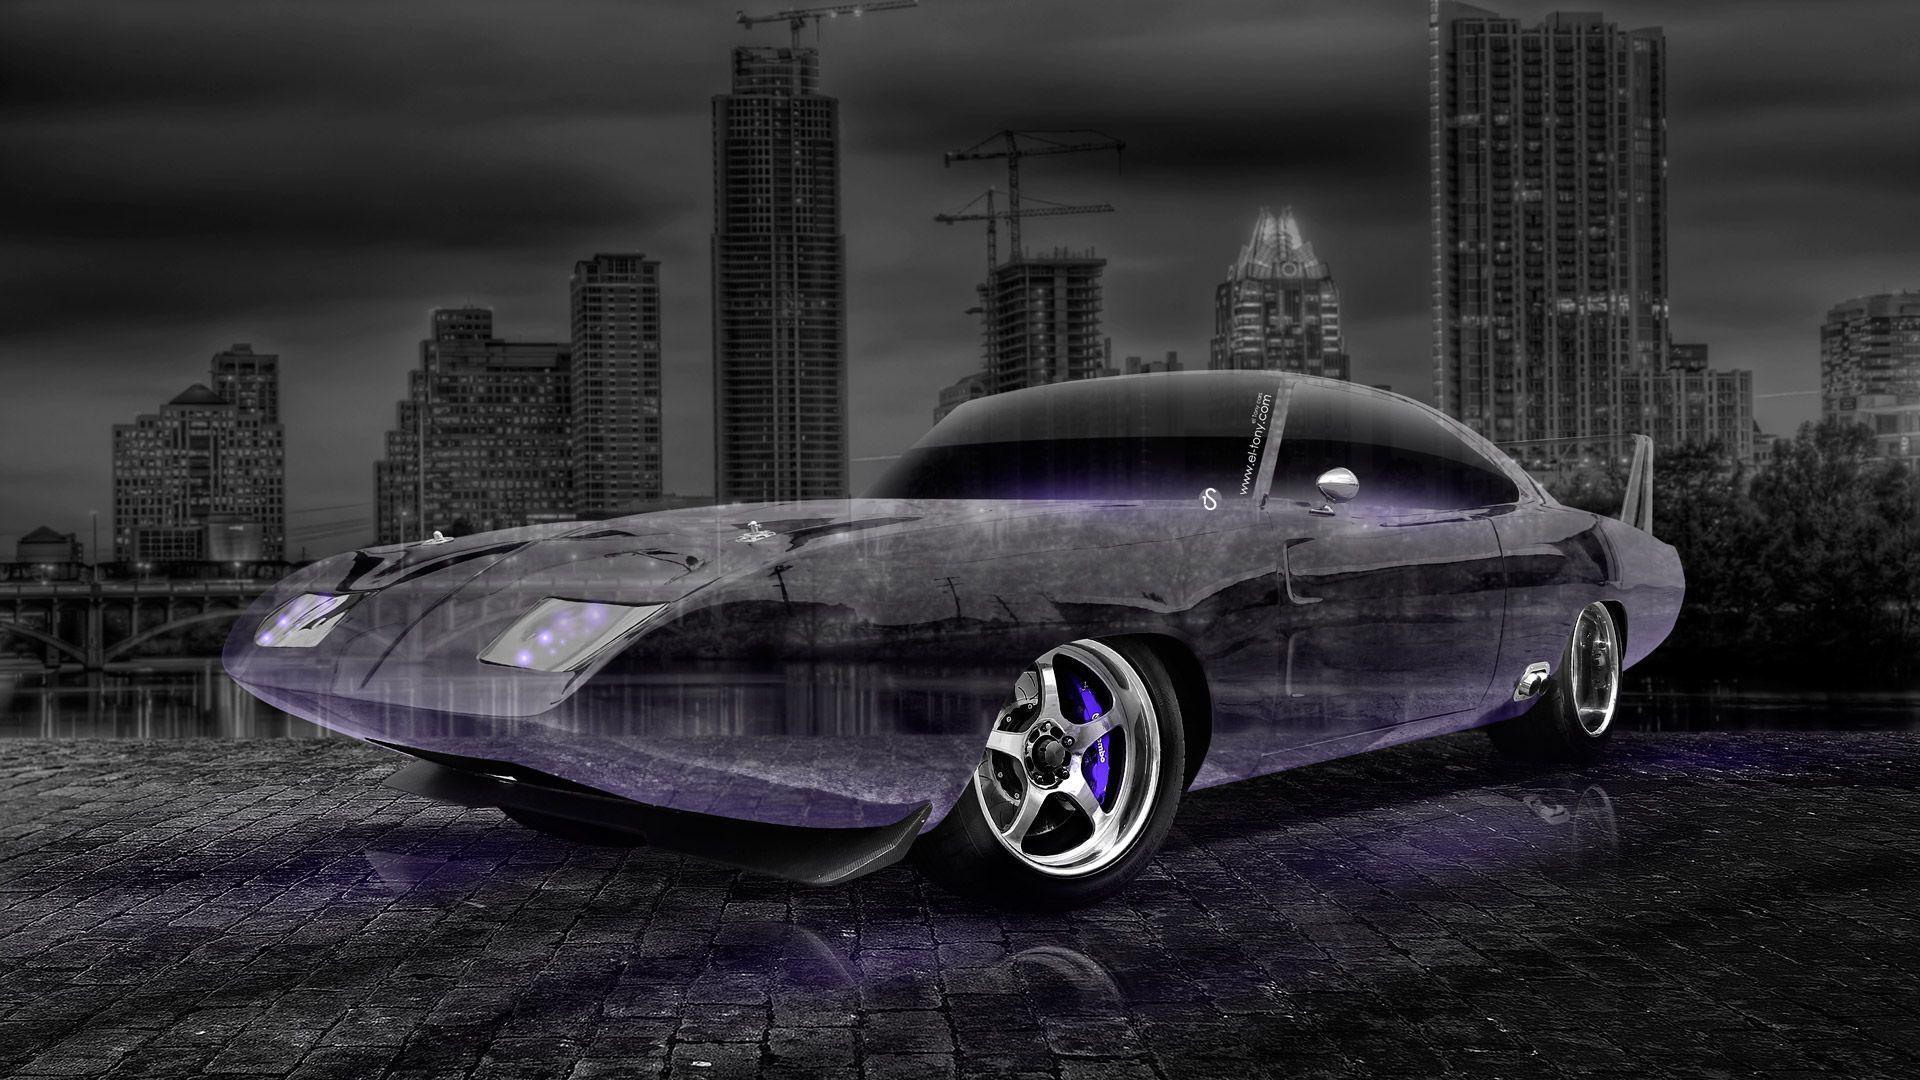 Dodge Charger Daytona Muscle Crystal City Car 2014 | El Tony